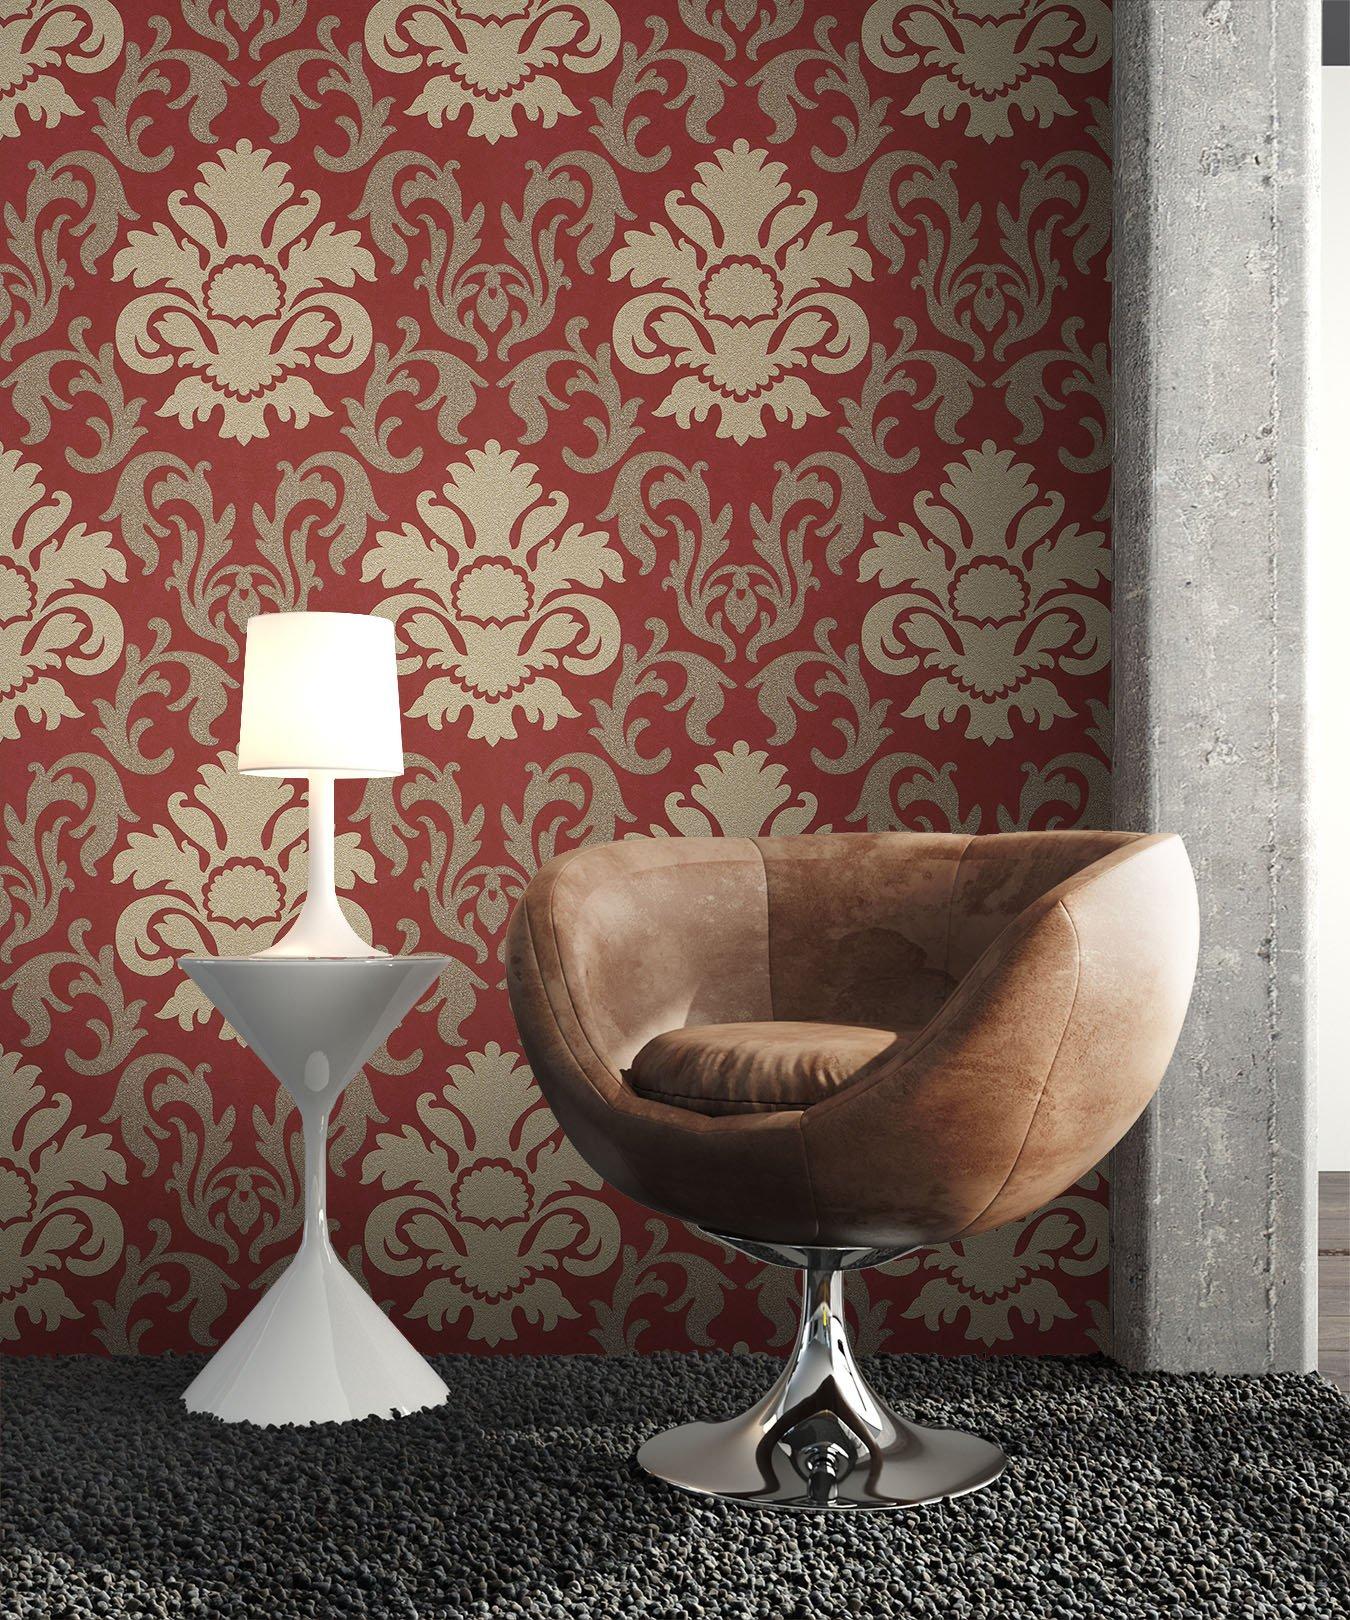 vliestapete rot deco muster barock newroom. Black Bedroom Furniture Sets. Home Design Ideas